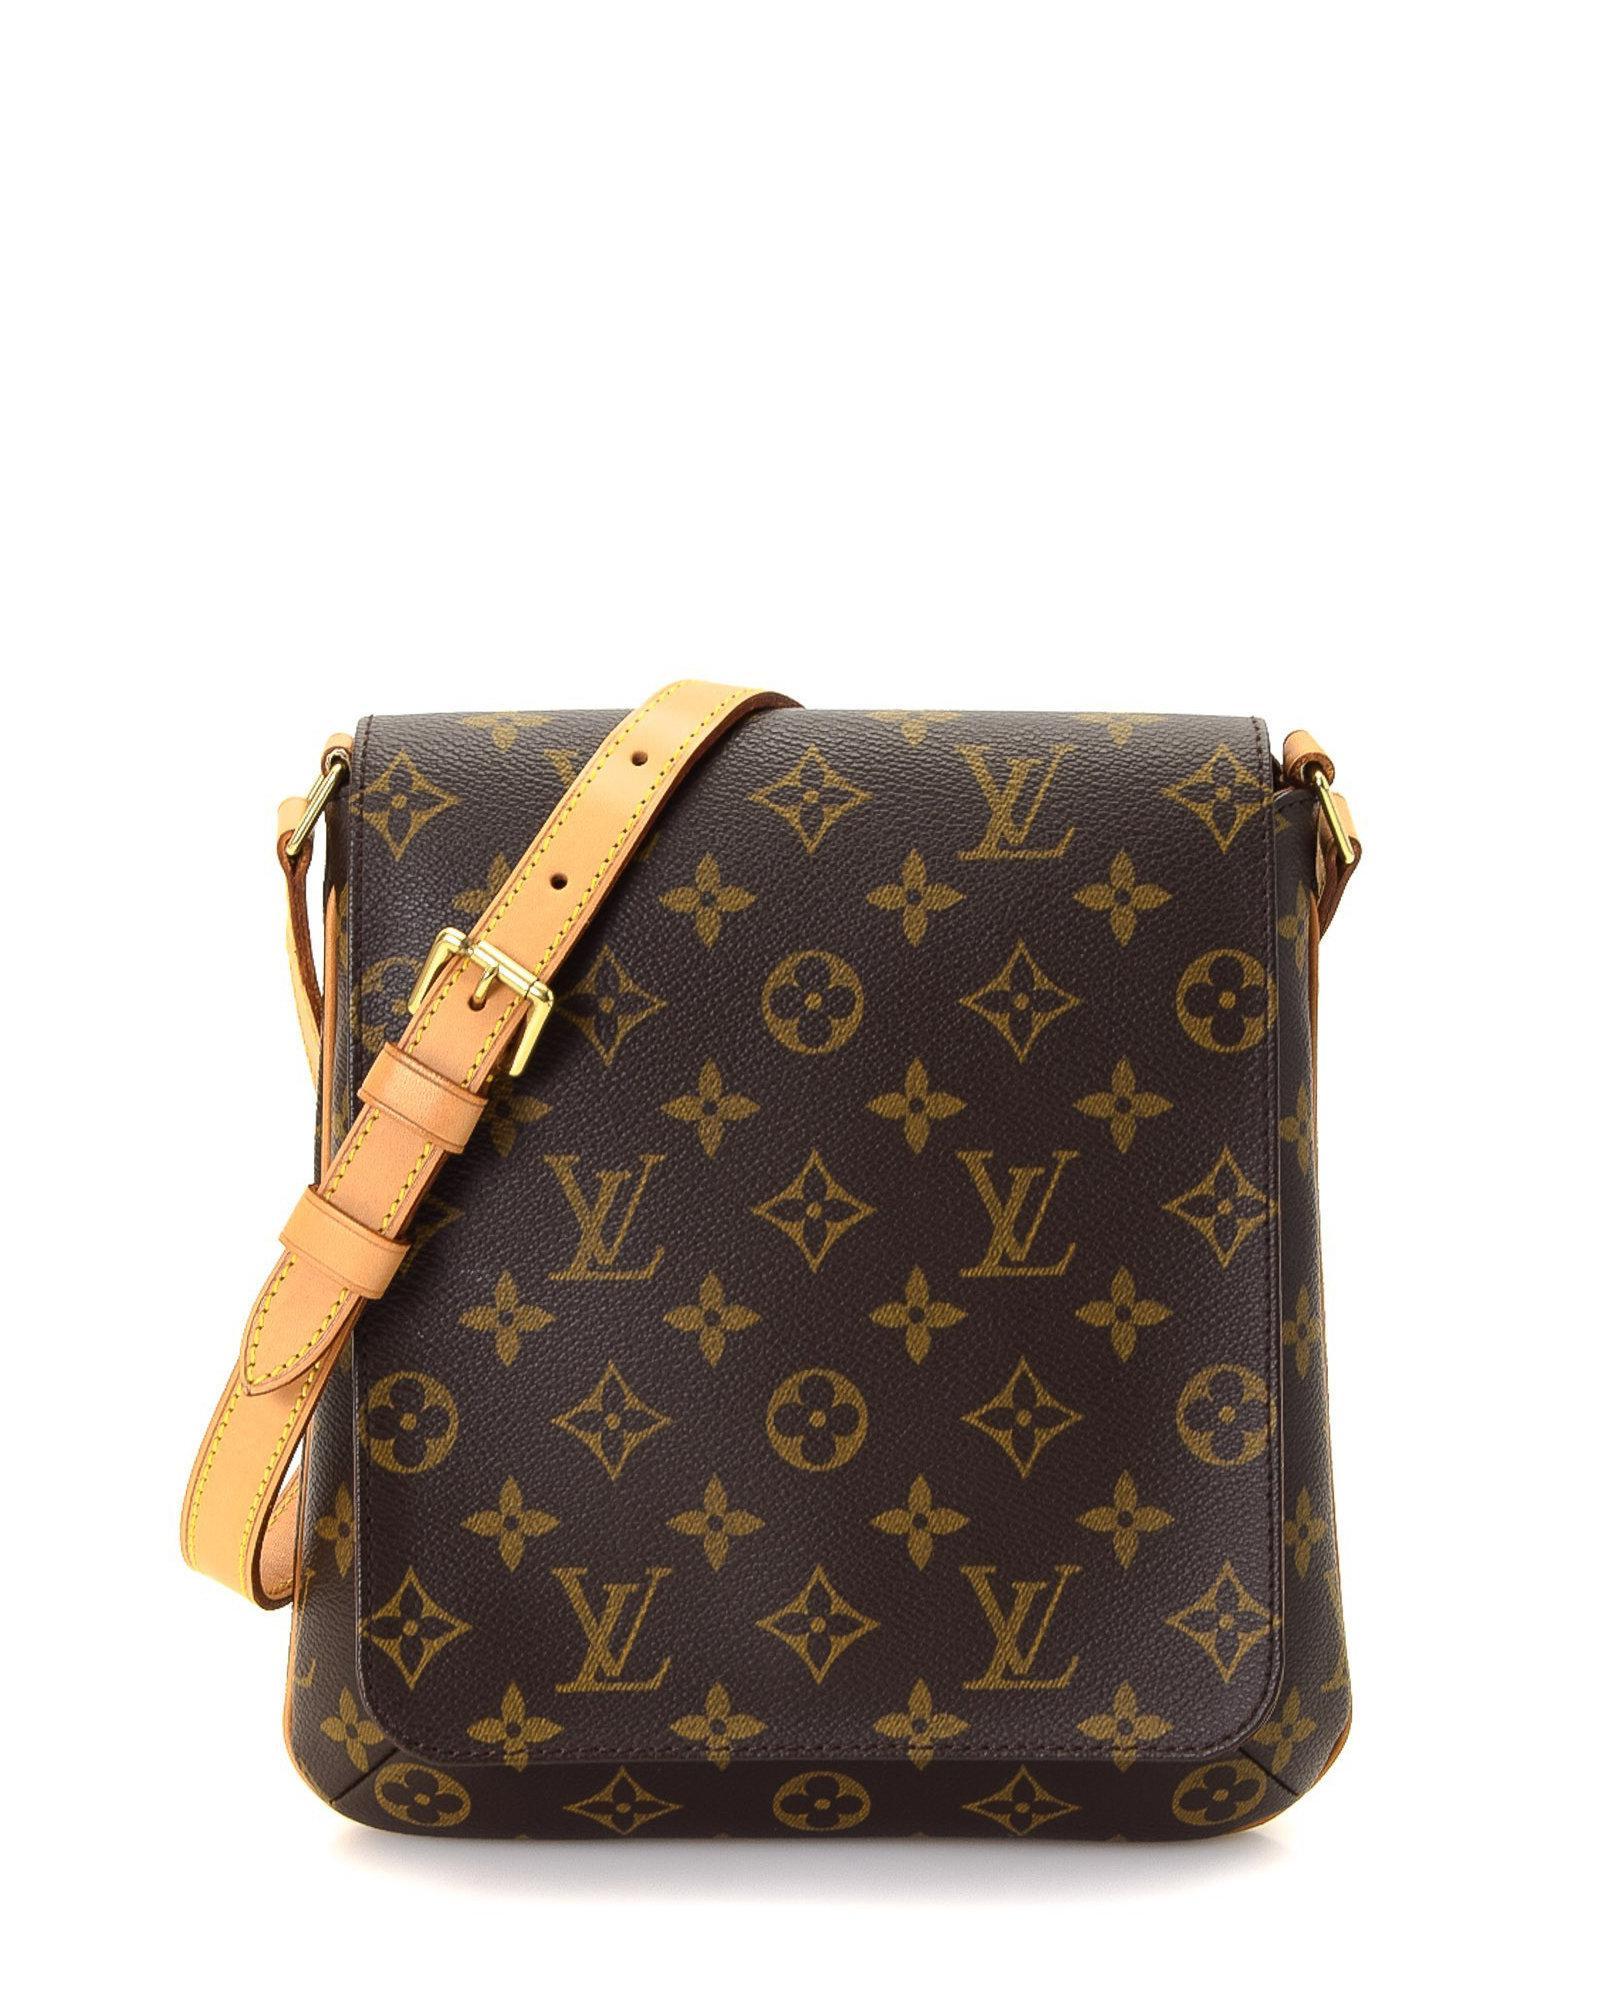 2390f51ebac8 Lyst - Louis Vuitton Crossbody Bag - Vintage in Brown